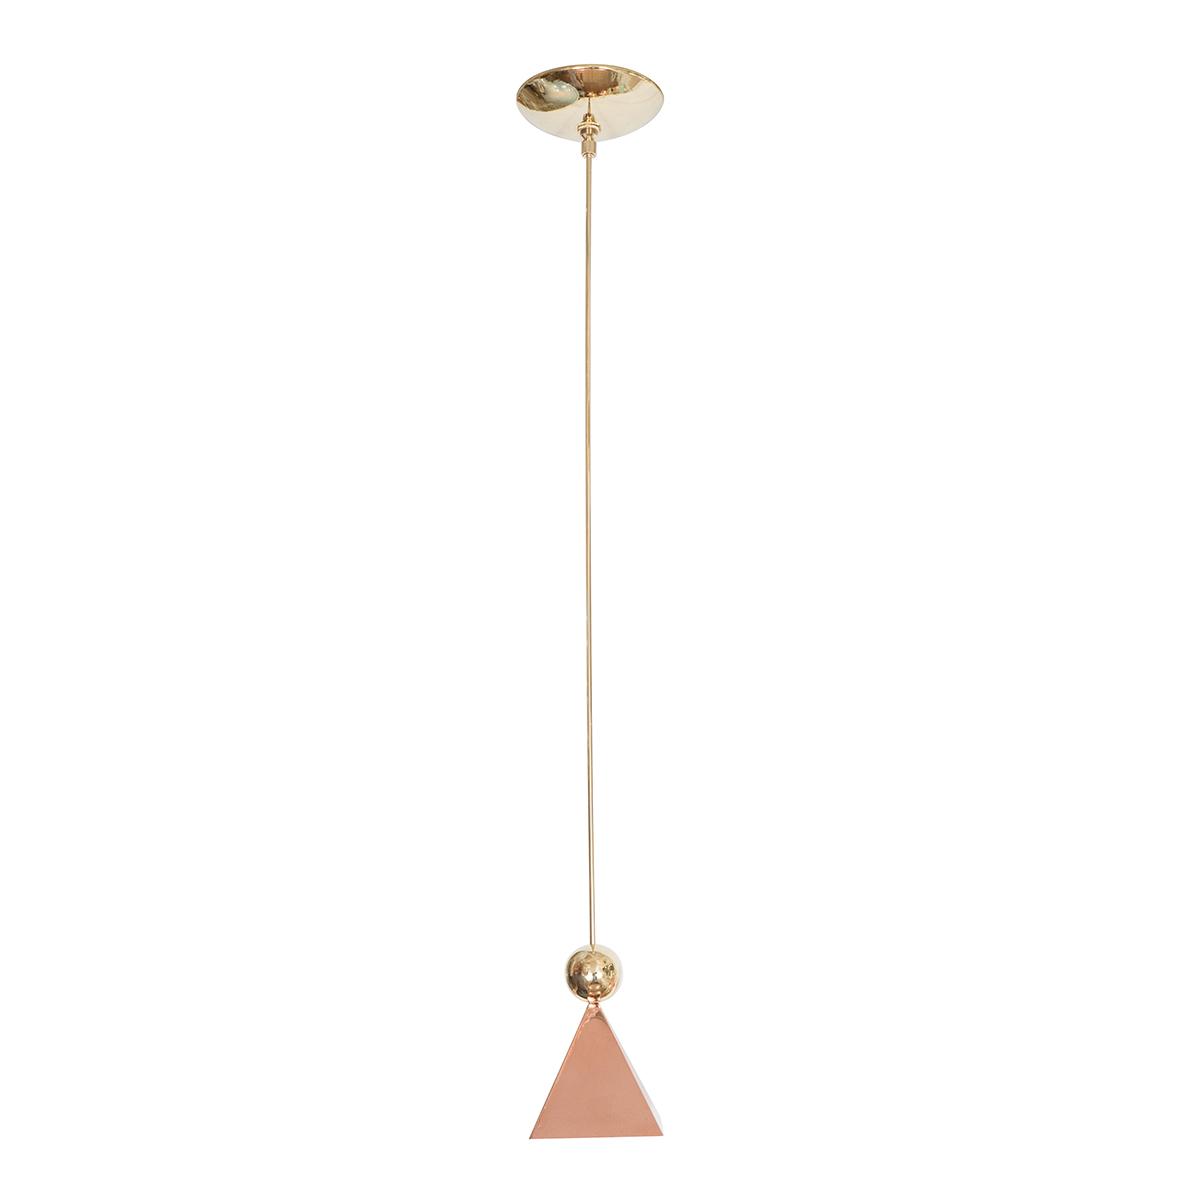 Copper pyramid pendant | Chandeliers & Pendants | John Salibello